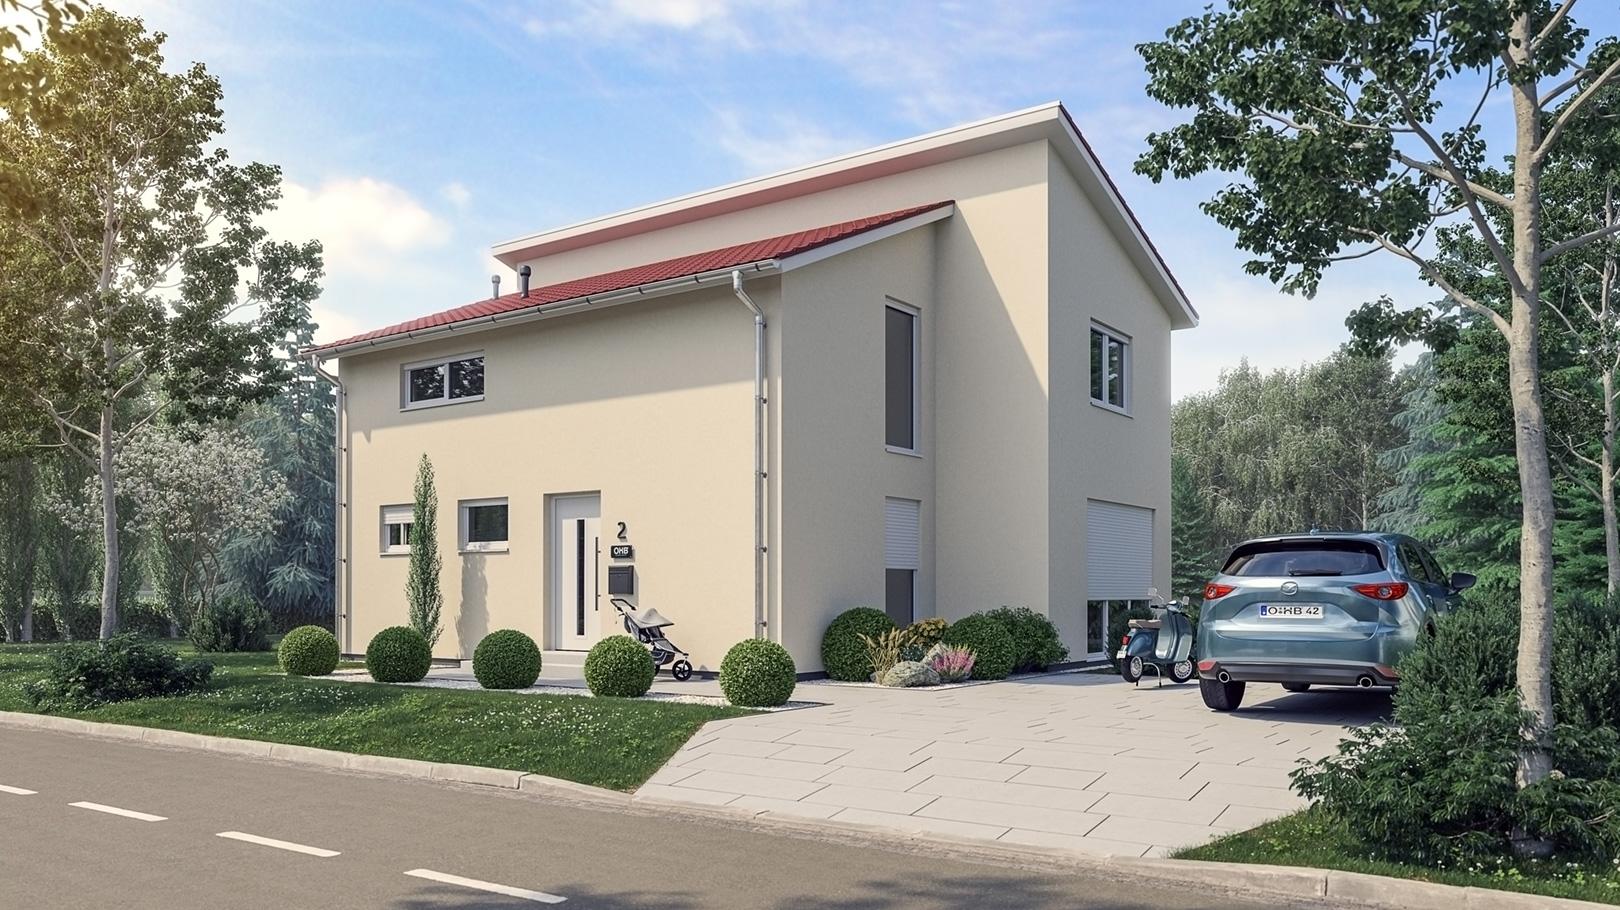 Haus-Idee Schweinfurt